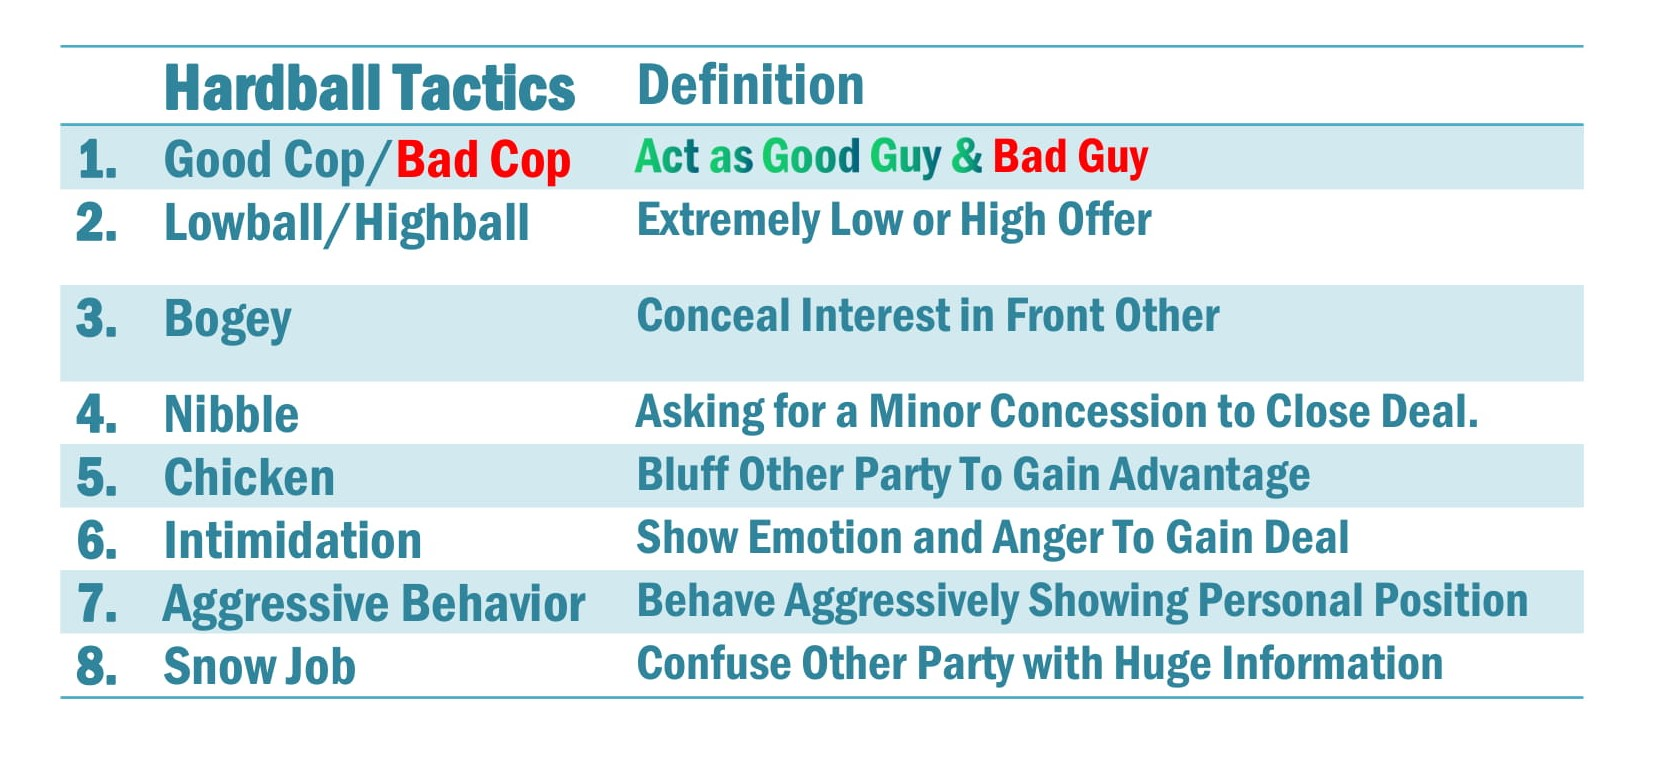 Hardball Tactics Examples-The 8 Typical Hardball Tactics in Negotiation